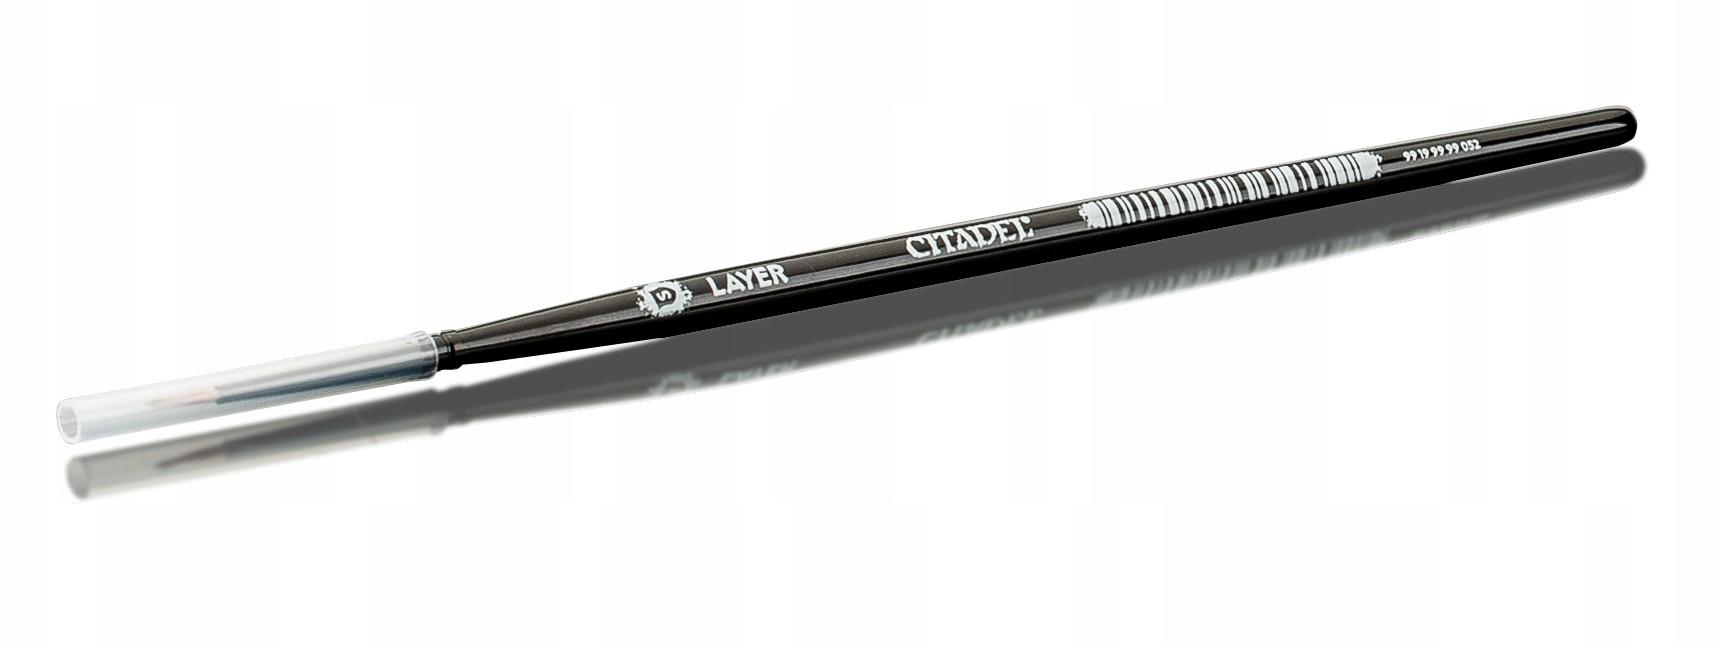 Citadel Small Layer Brush S pędzelek rozmiar s